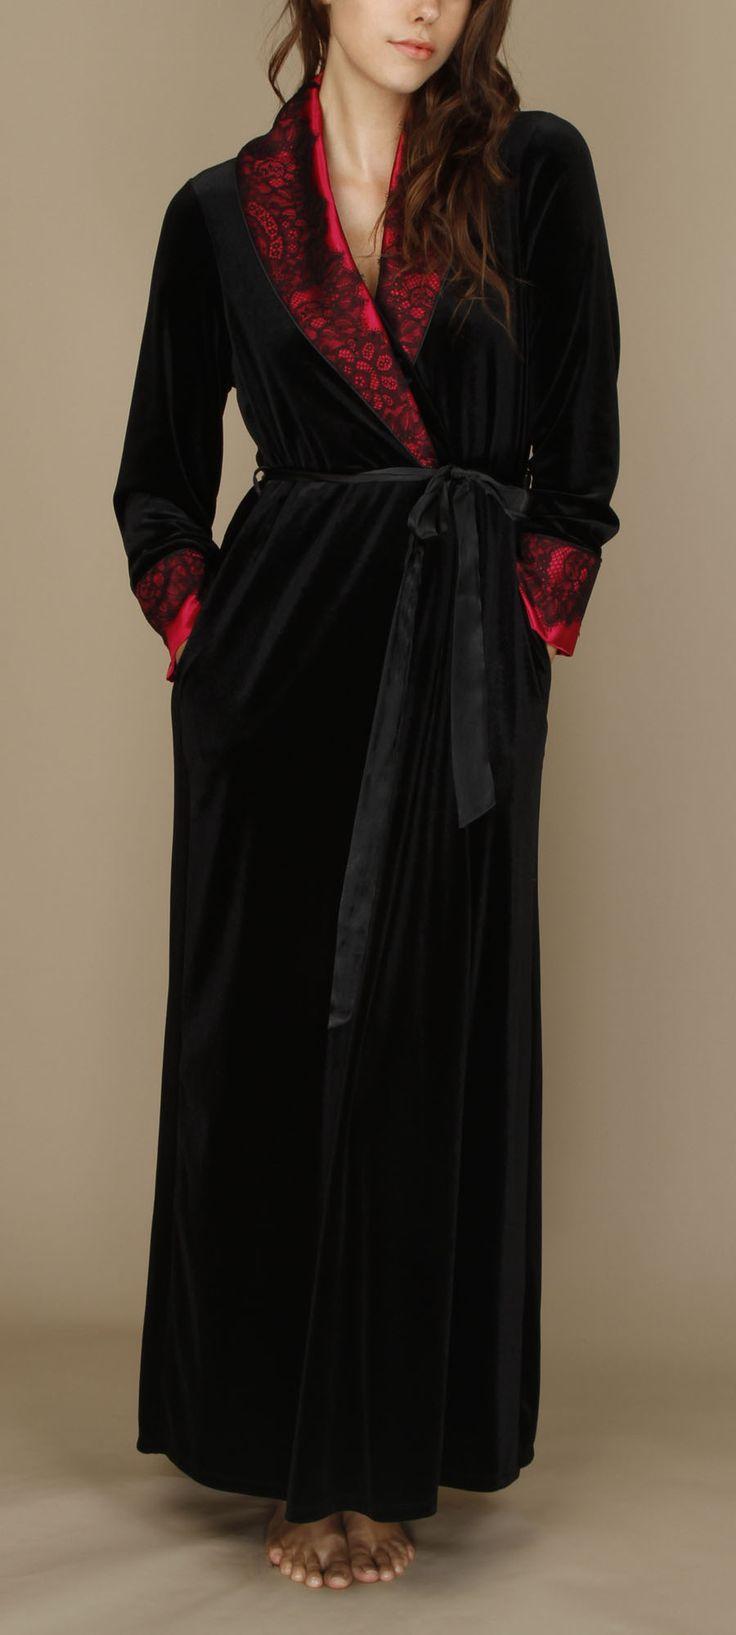 442 best Clothes images on Pinterest | Velvet, Fall winter fashion ...